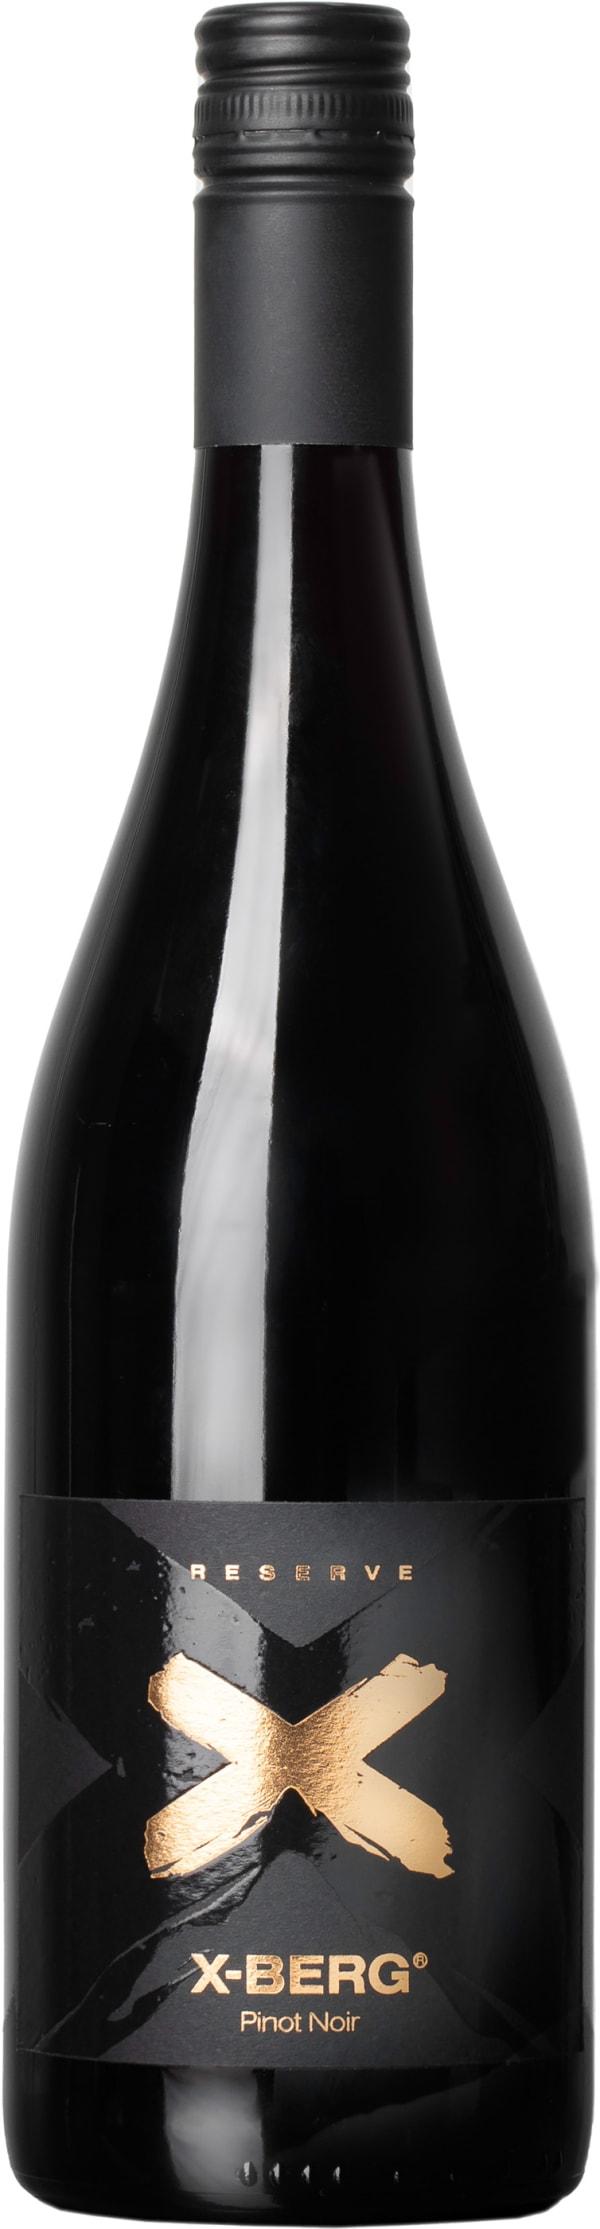 X-Berg Pinot Noir 2017